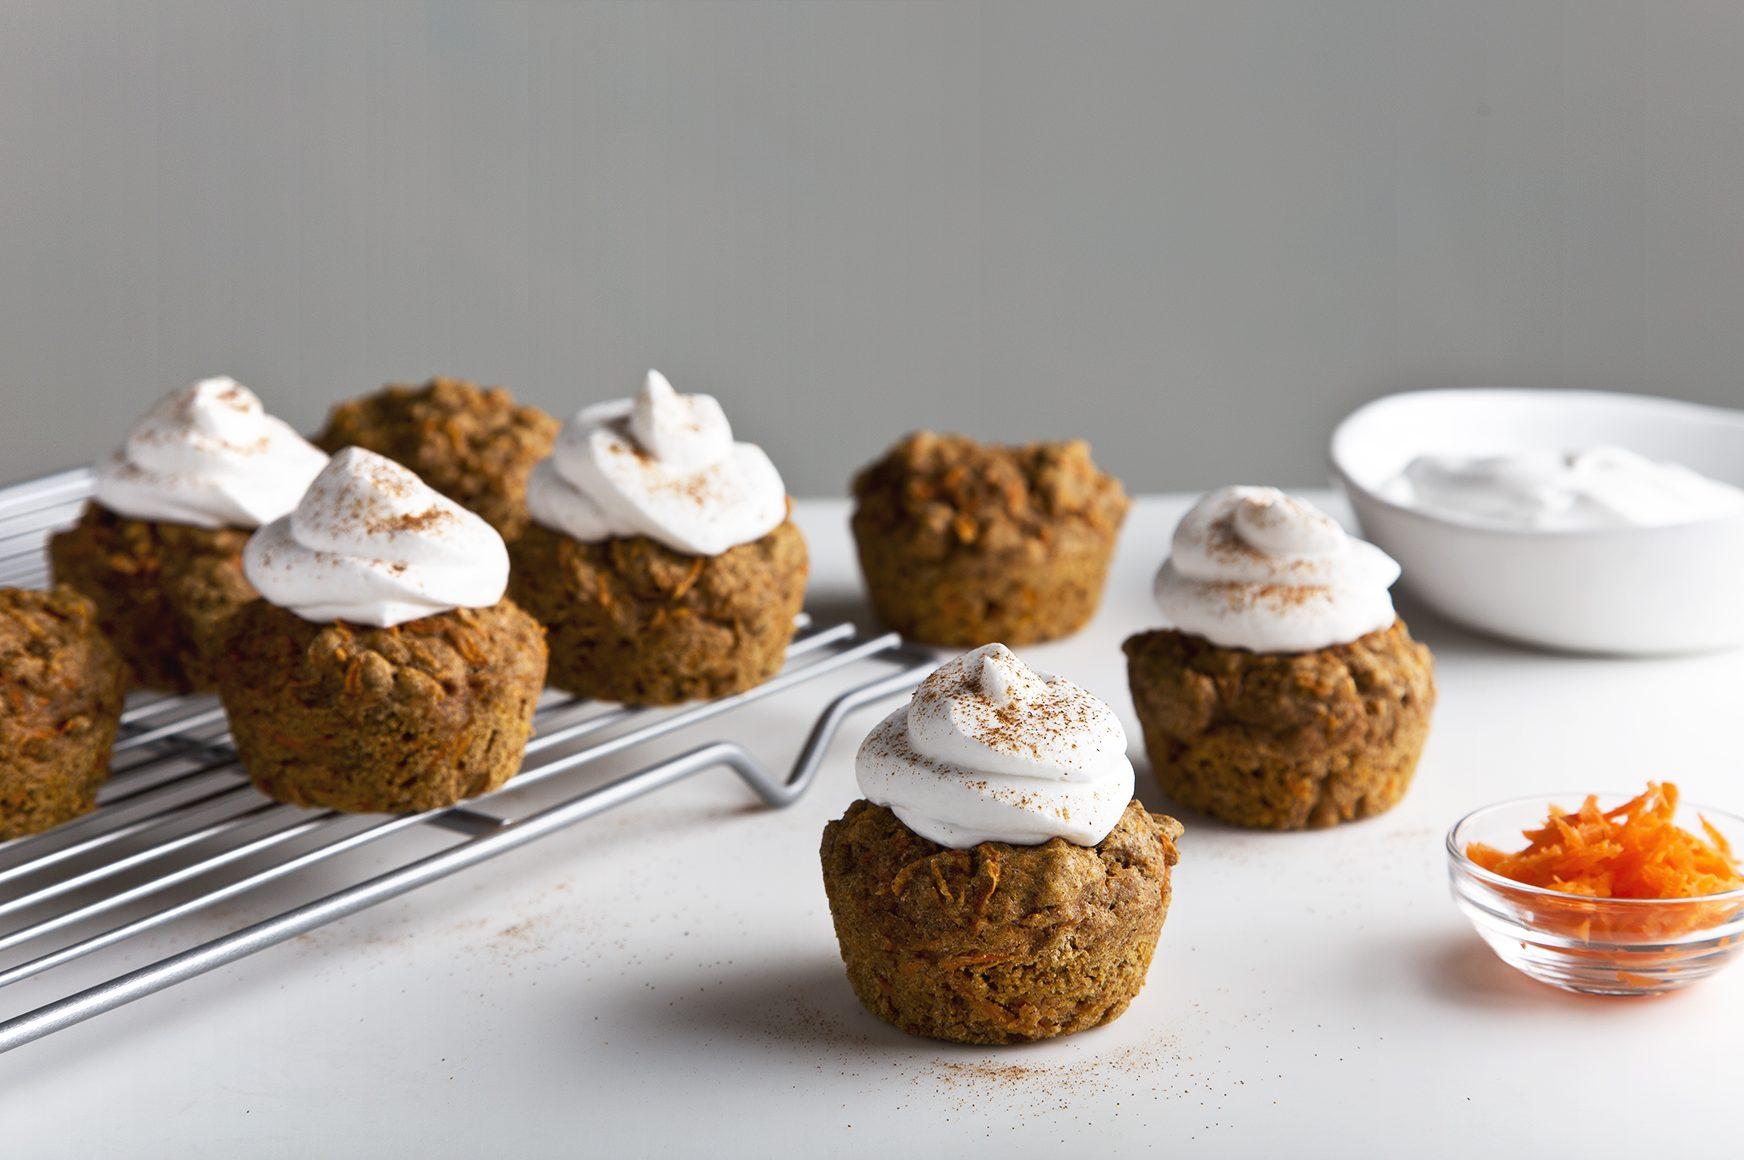 Hippie Vegan Carrot Muffins | picklesnhoney.com #vegan #wholegrain #carrot #muffins #recipe